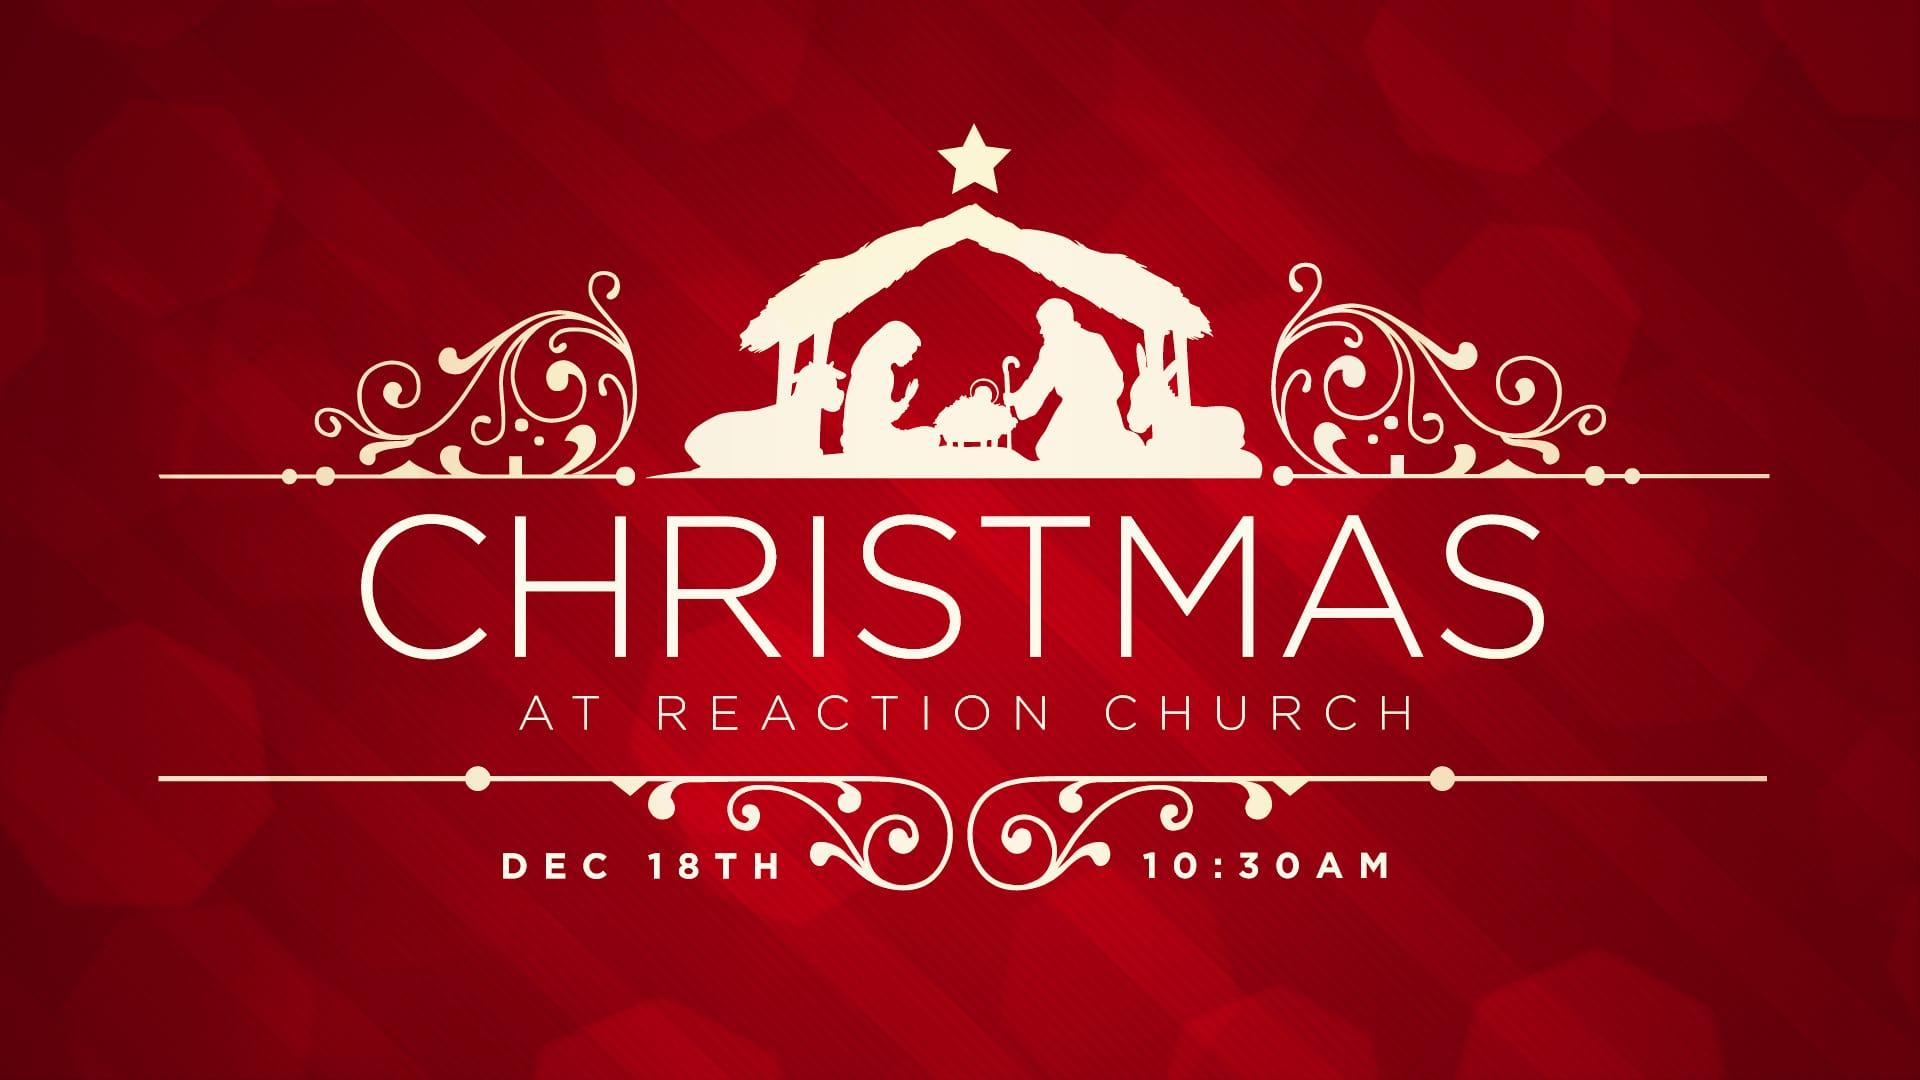 church graphic design media resources mission